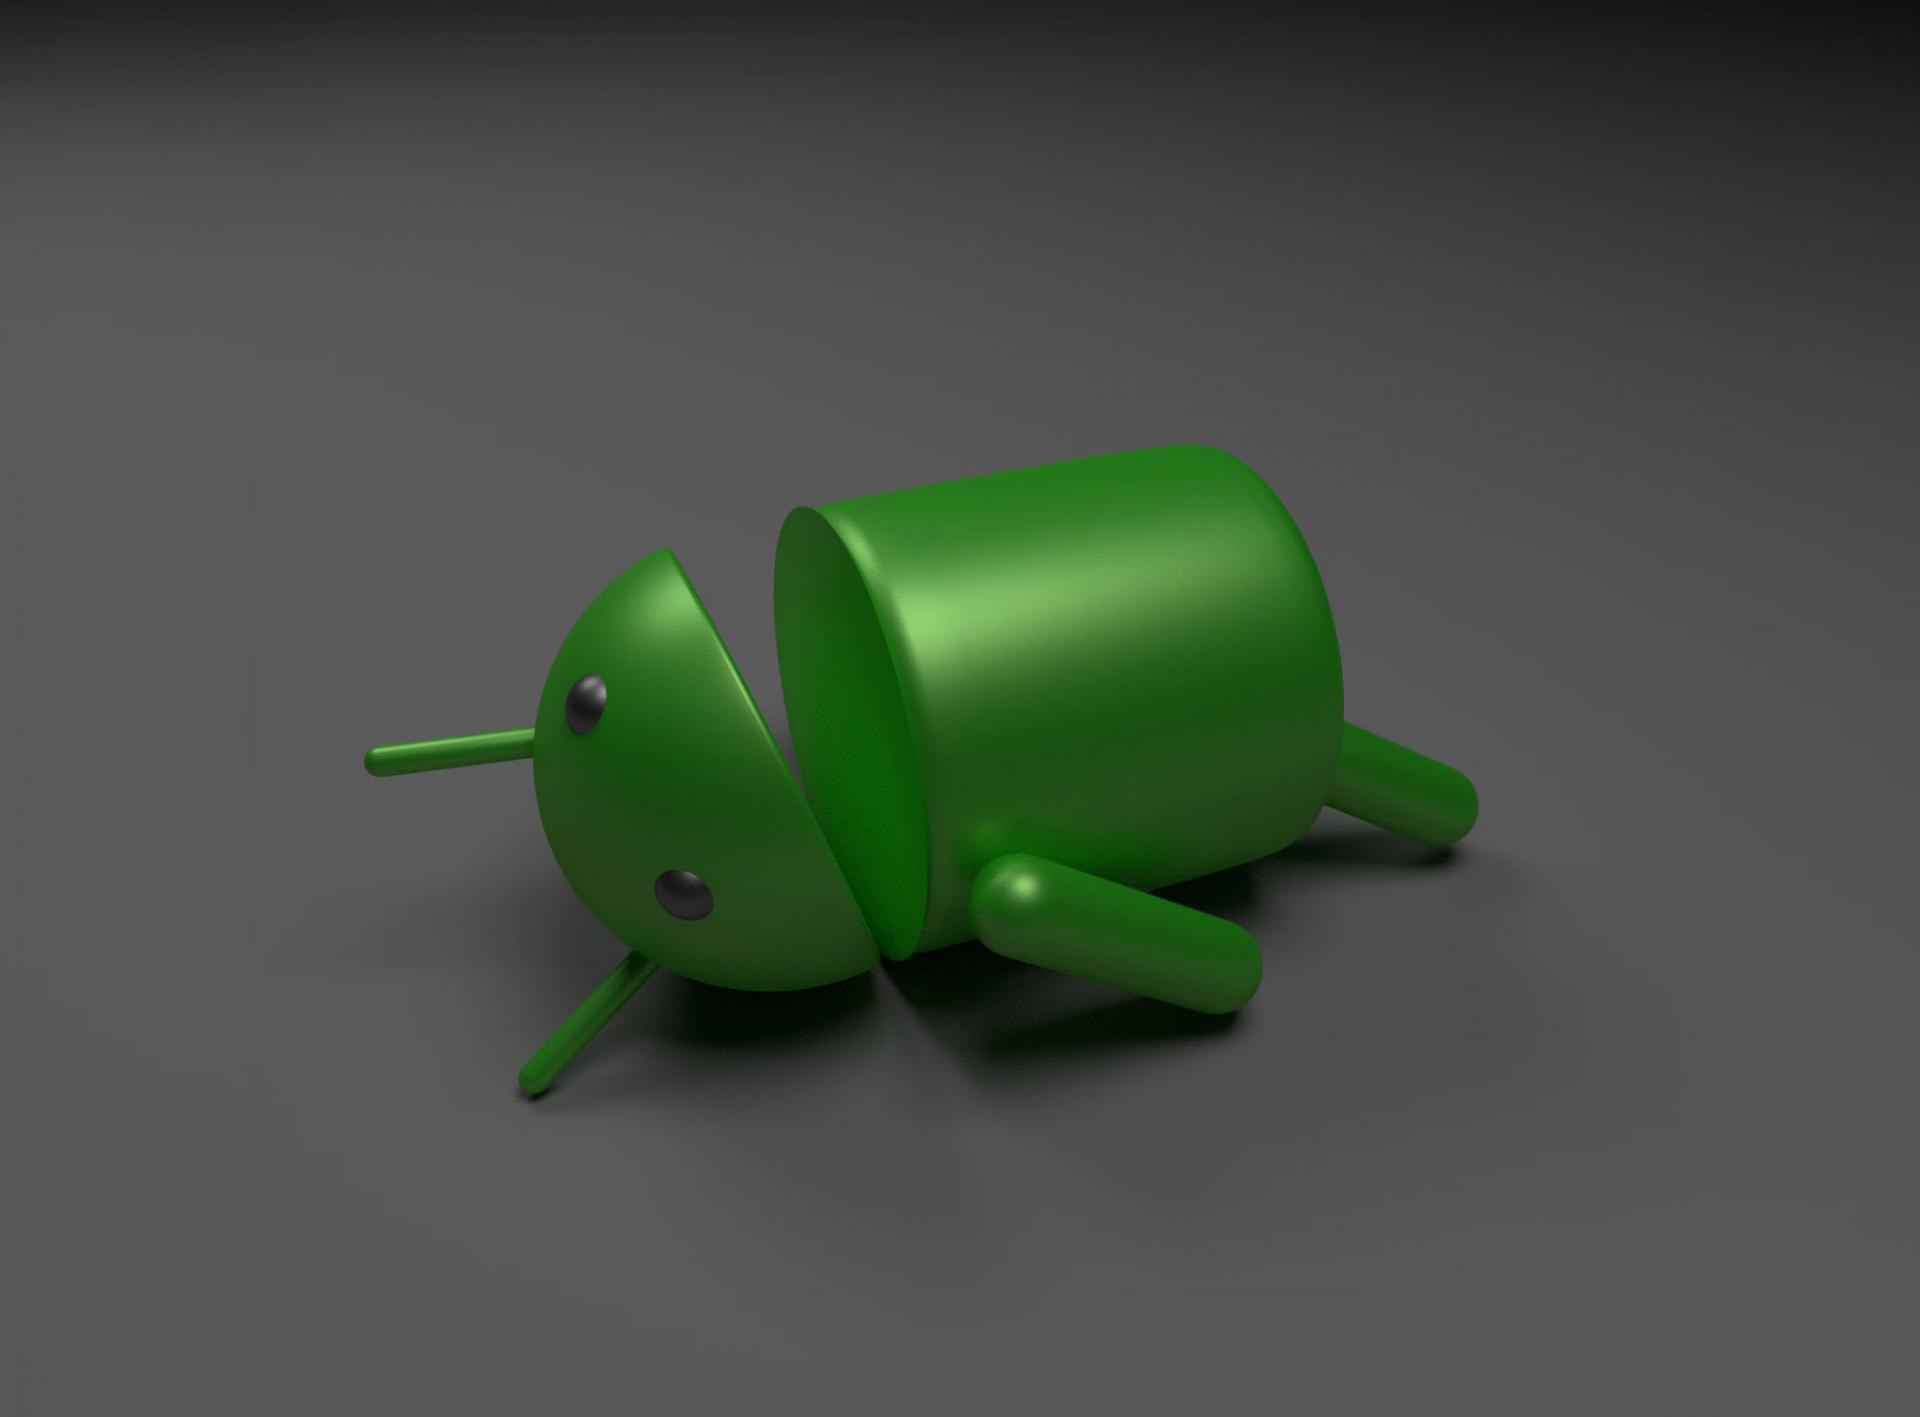 Android-троян обнаружен впопулярном клиенте для скачивания приложений